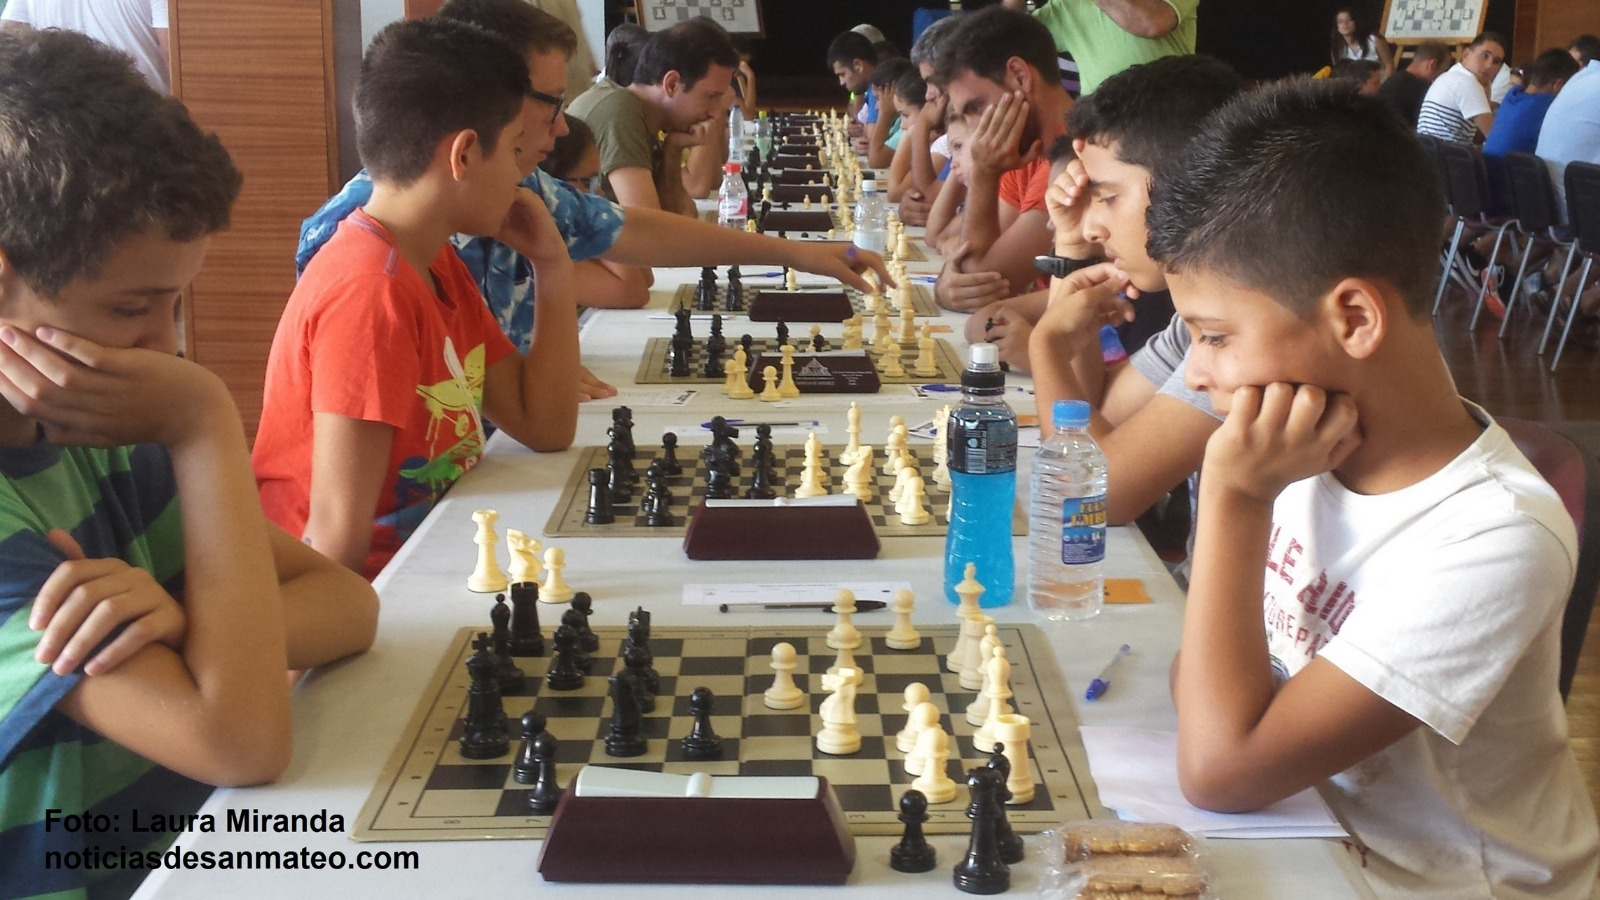 Torneo de ajedrez Tinamar 2015 Foto Noticias de San Mateo Laura Miranda